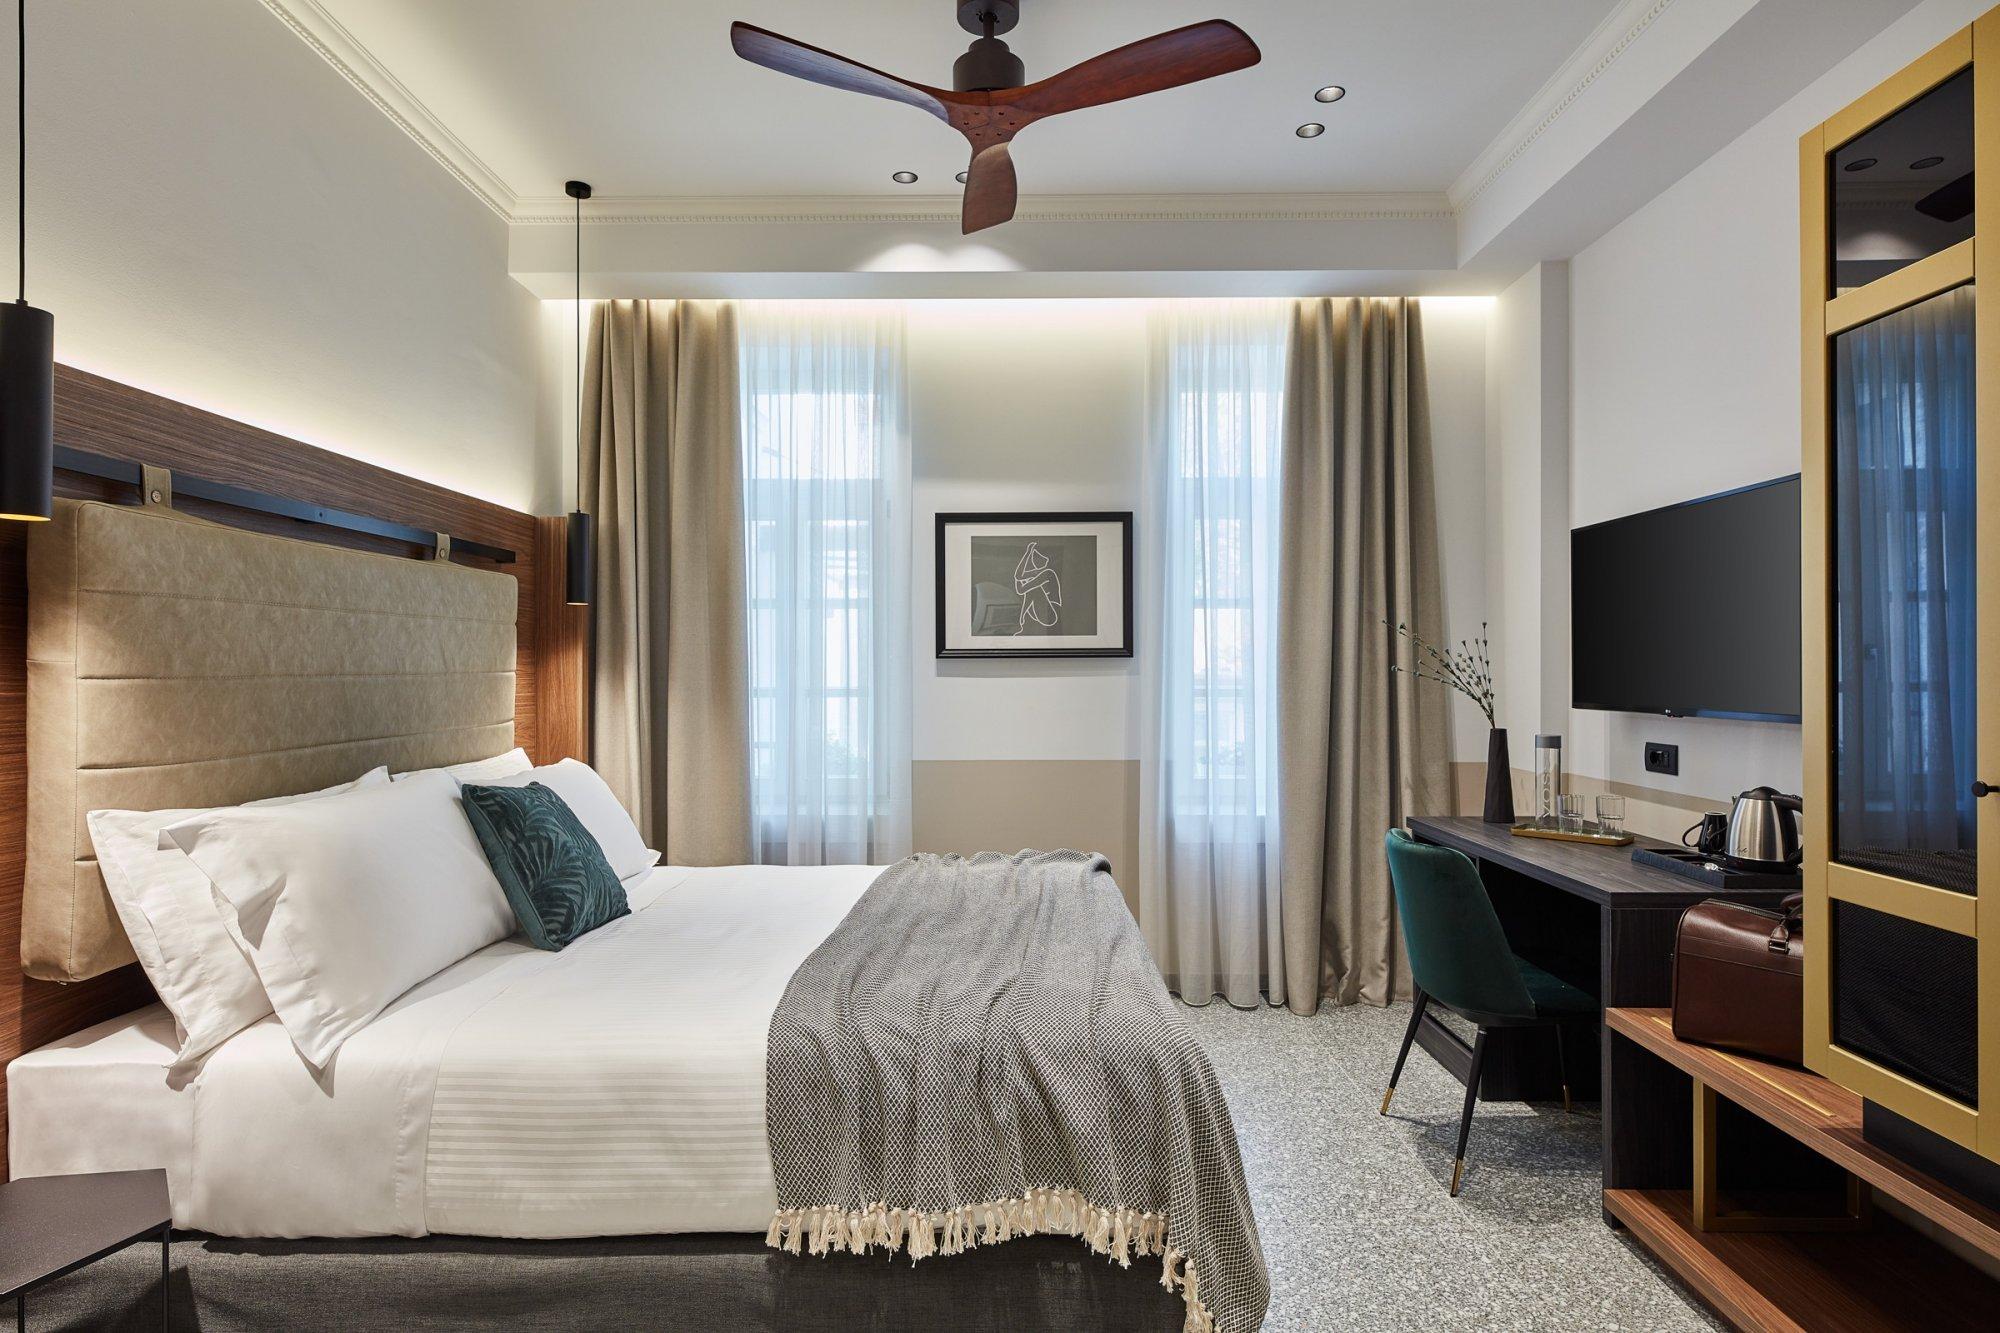 Lithia Hotel - Ιωάννινα εικόνα